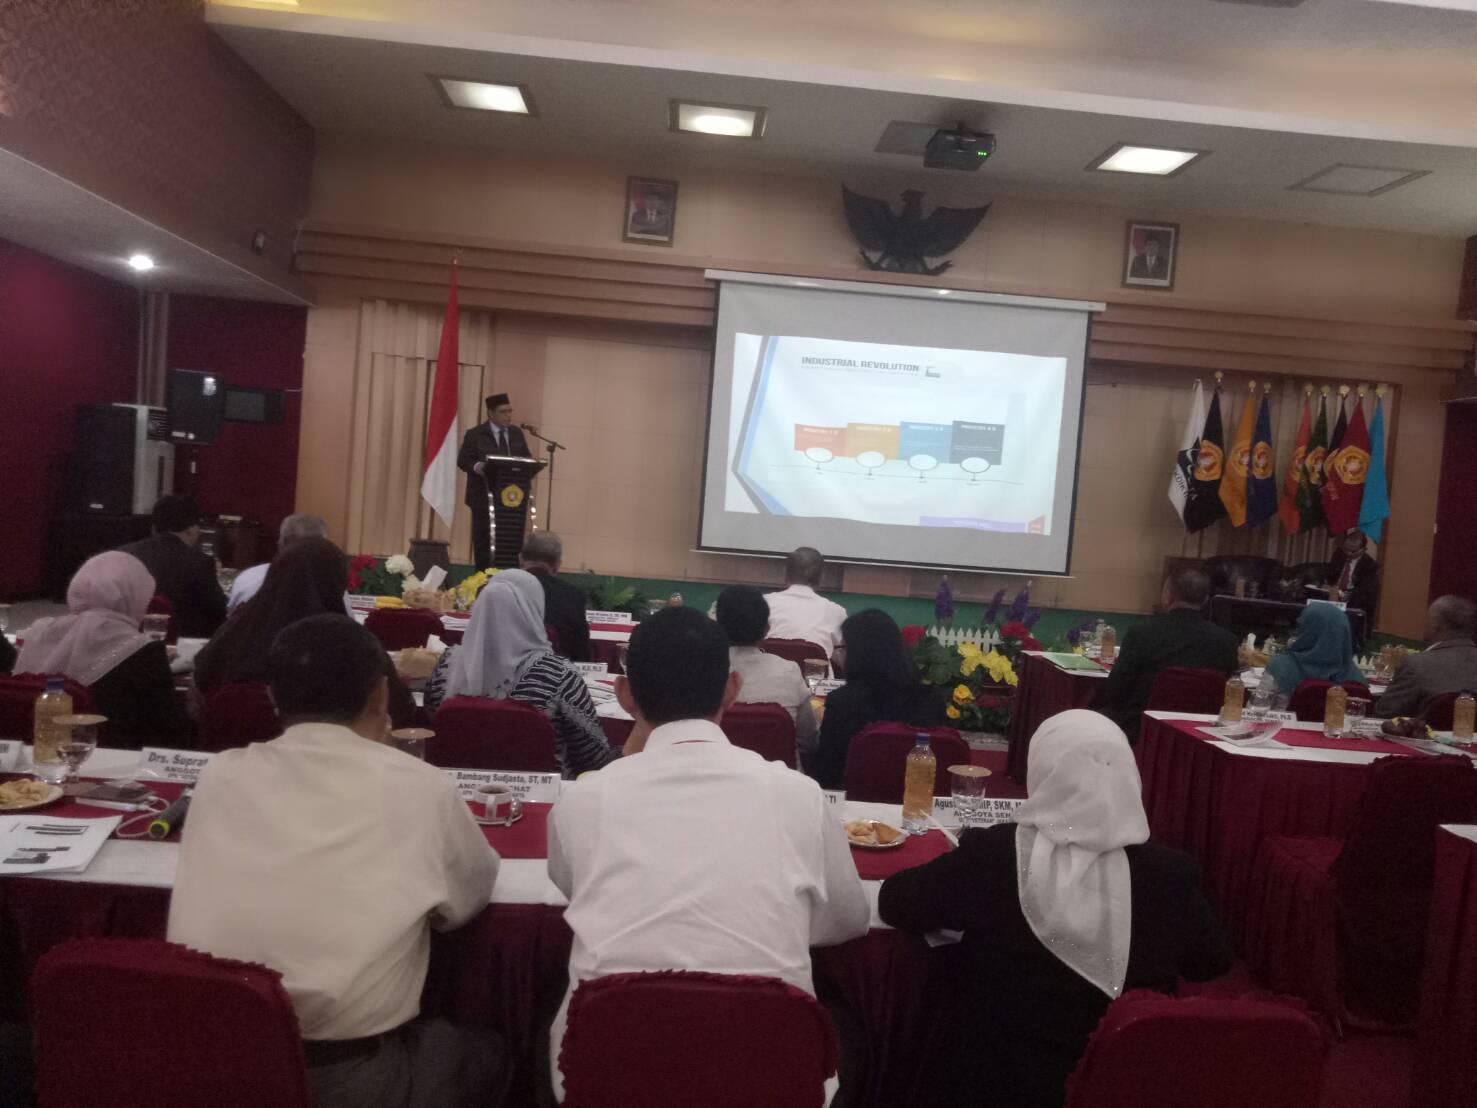 Calon Rektor UPNVJ Abdul Halim: UPNVJ Menghadapi Revolusi Industri 4.0